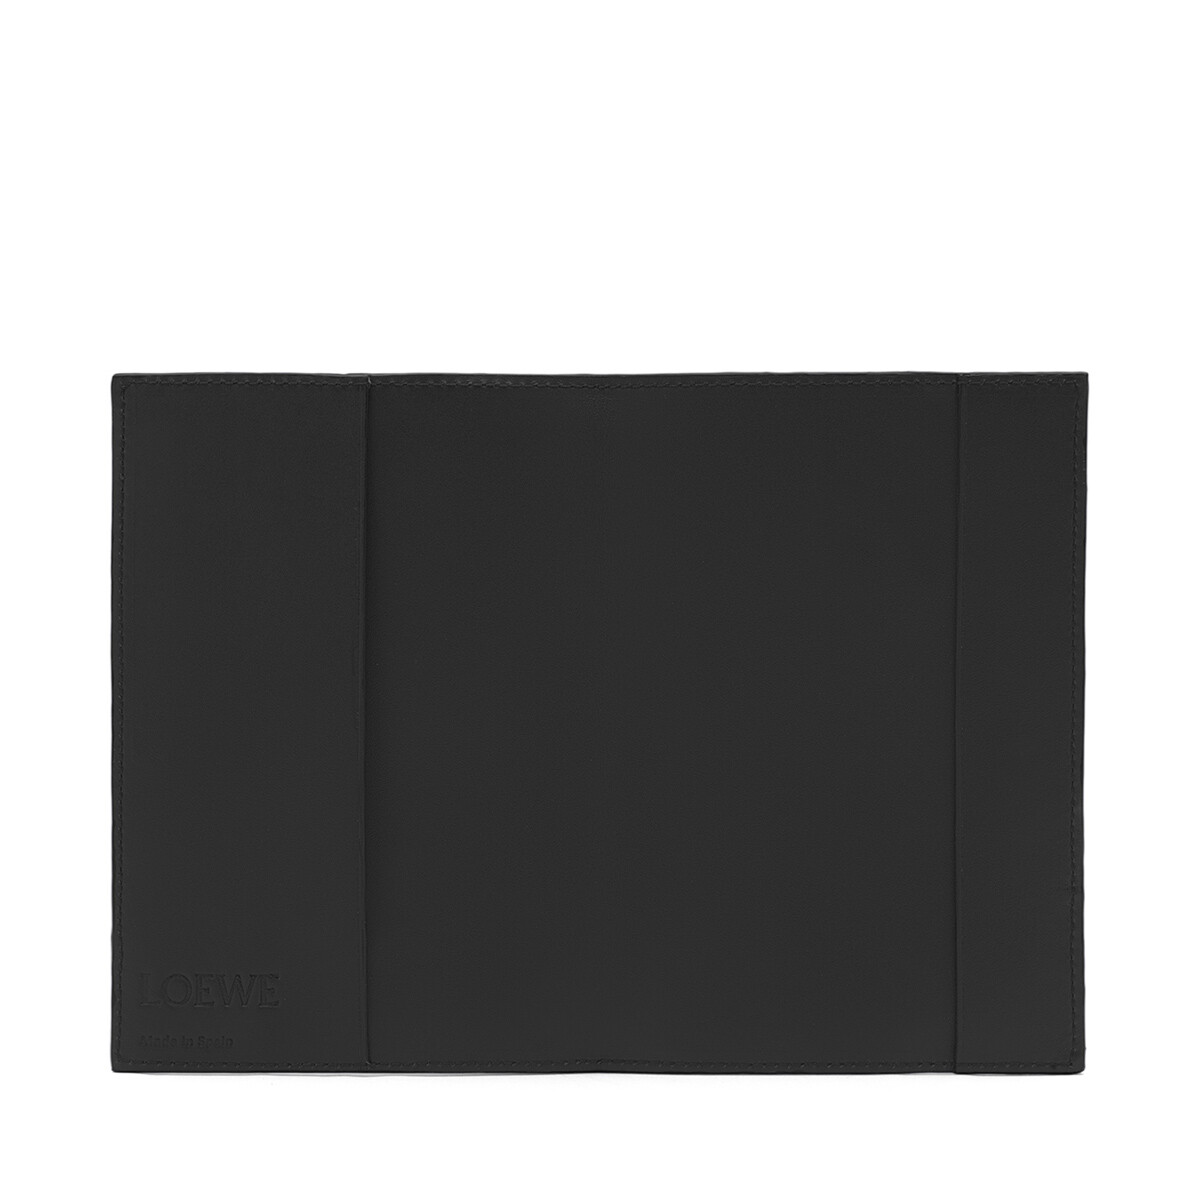 LOEWE パズル パスポート カバー ブラック front